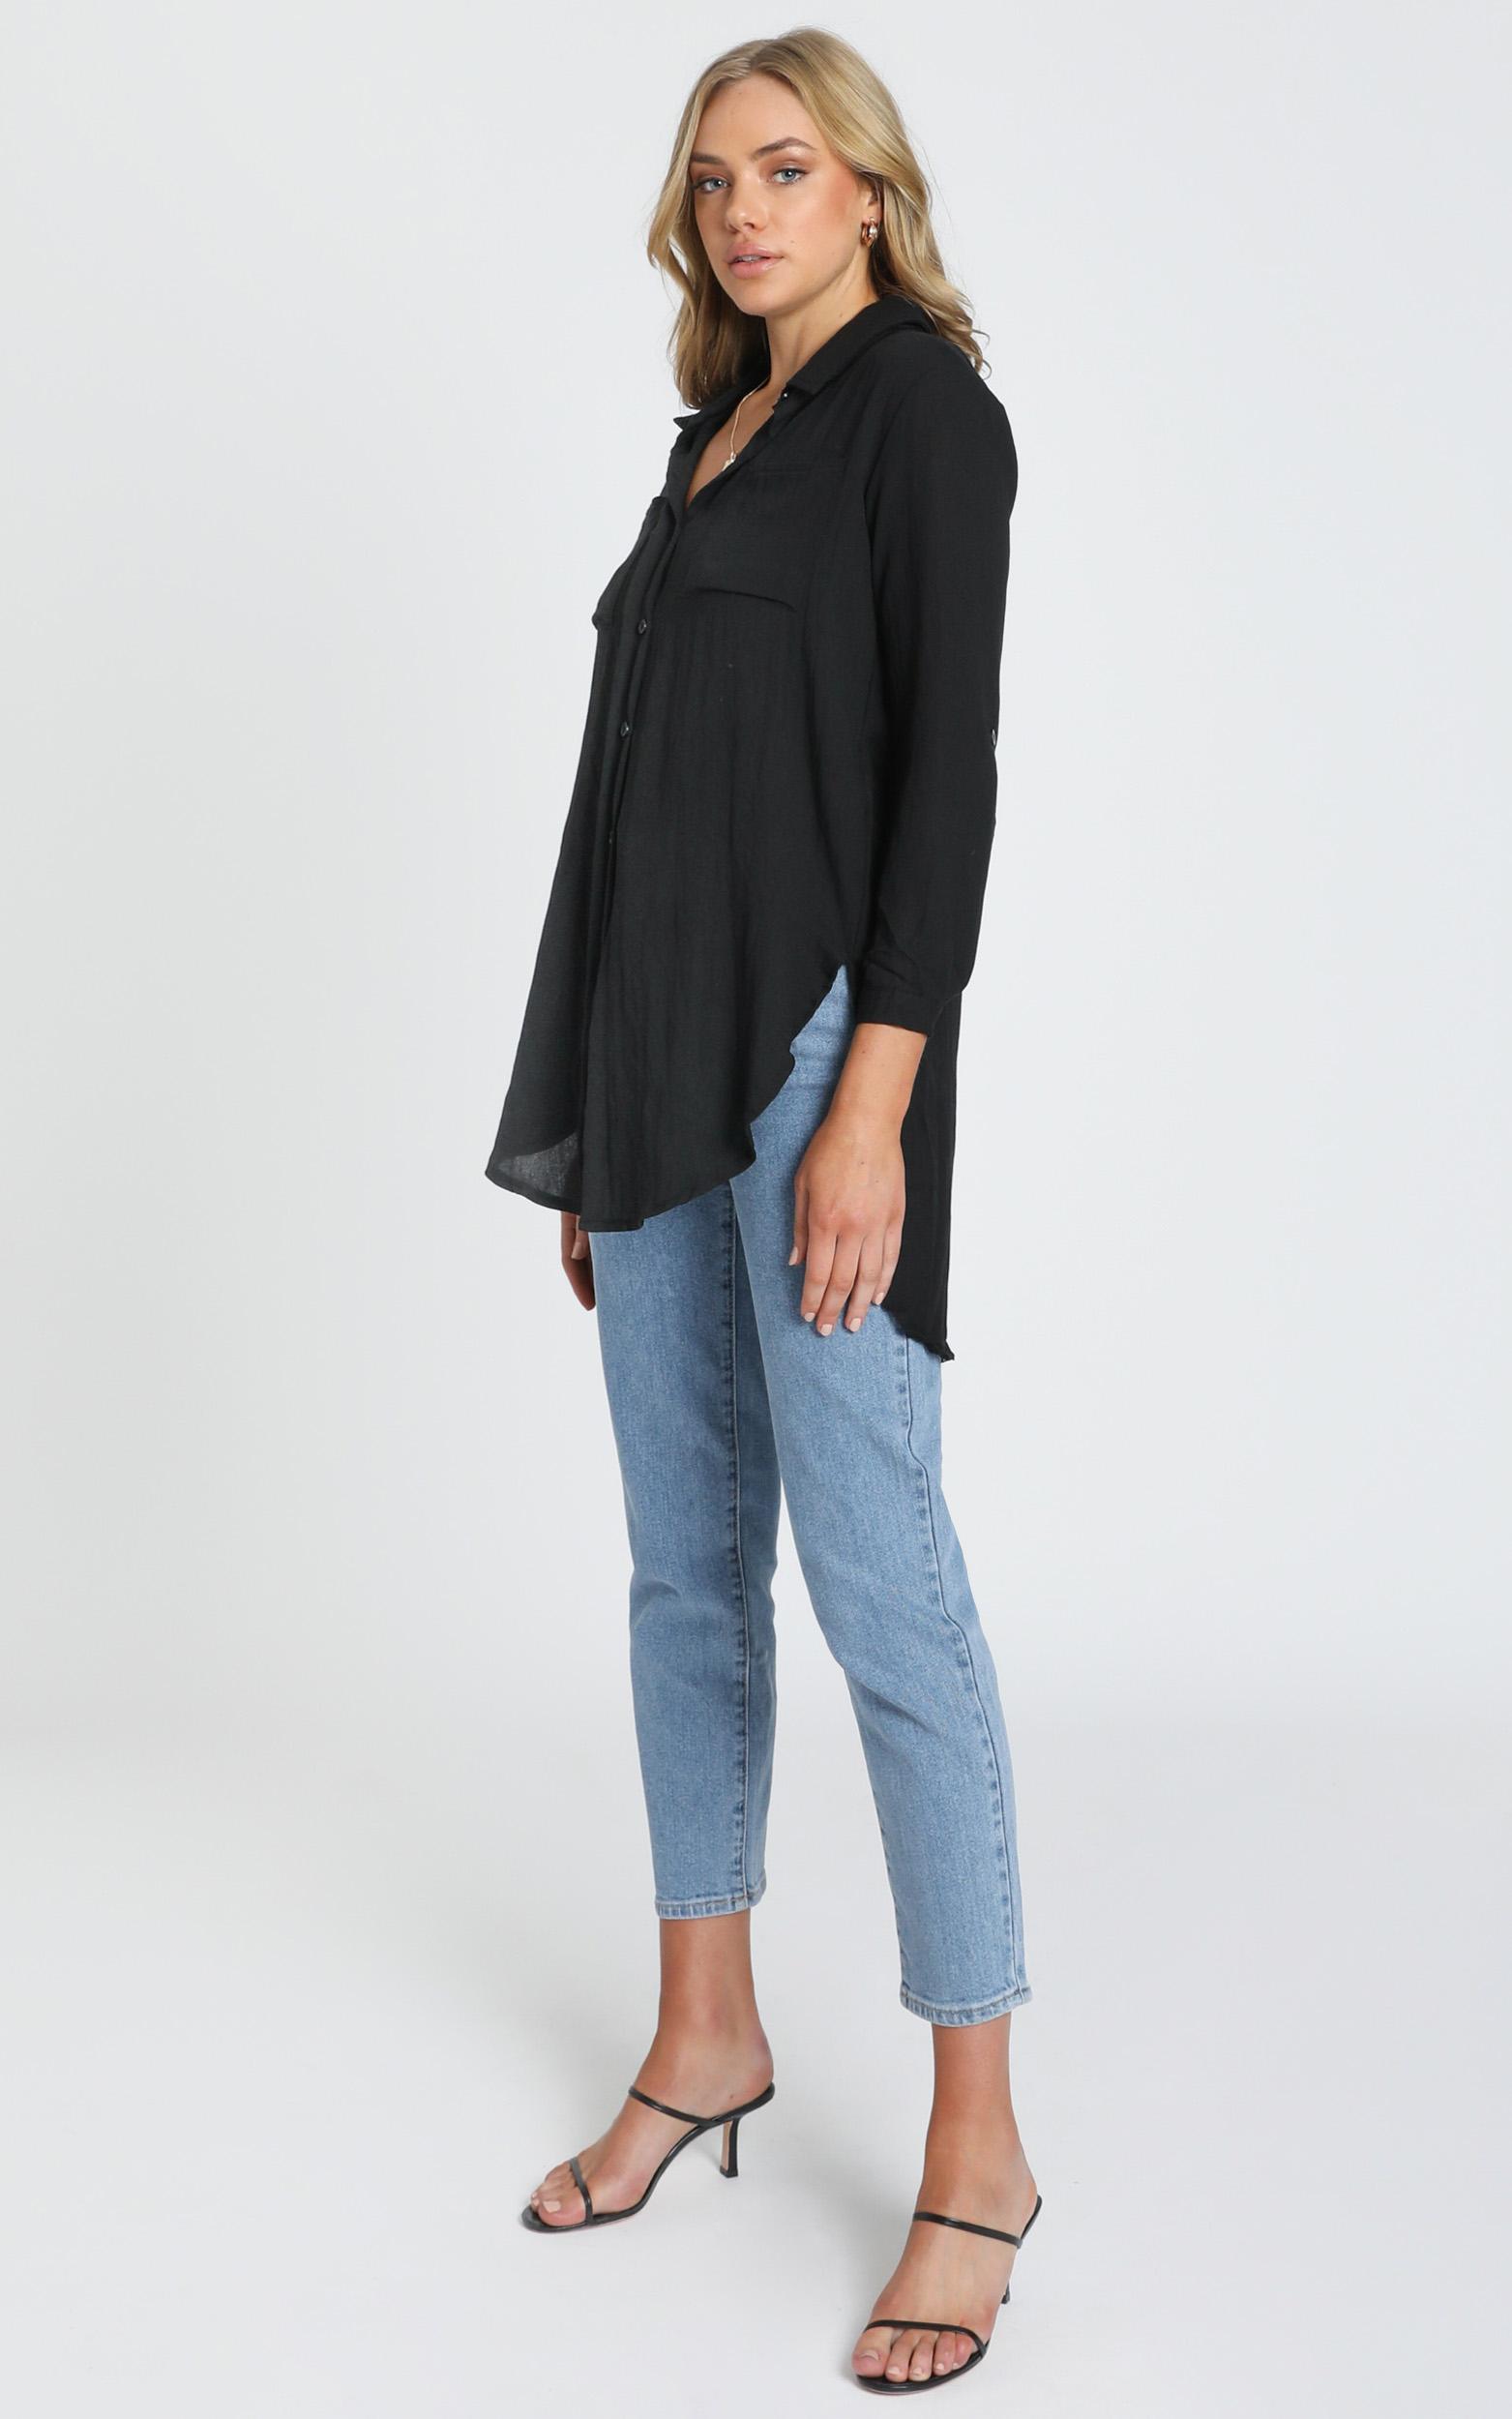 Trish Button Up Shirt In Black - 8 (S), Black, hi-res image number null